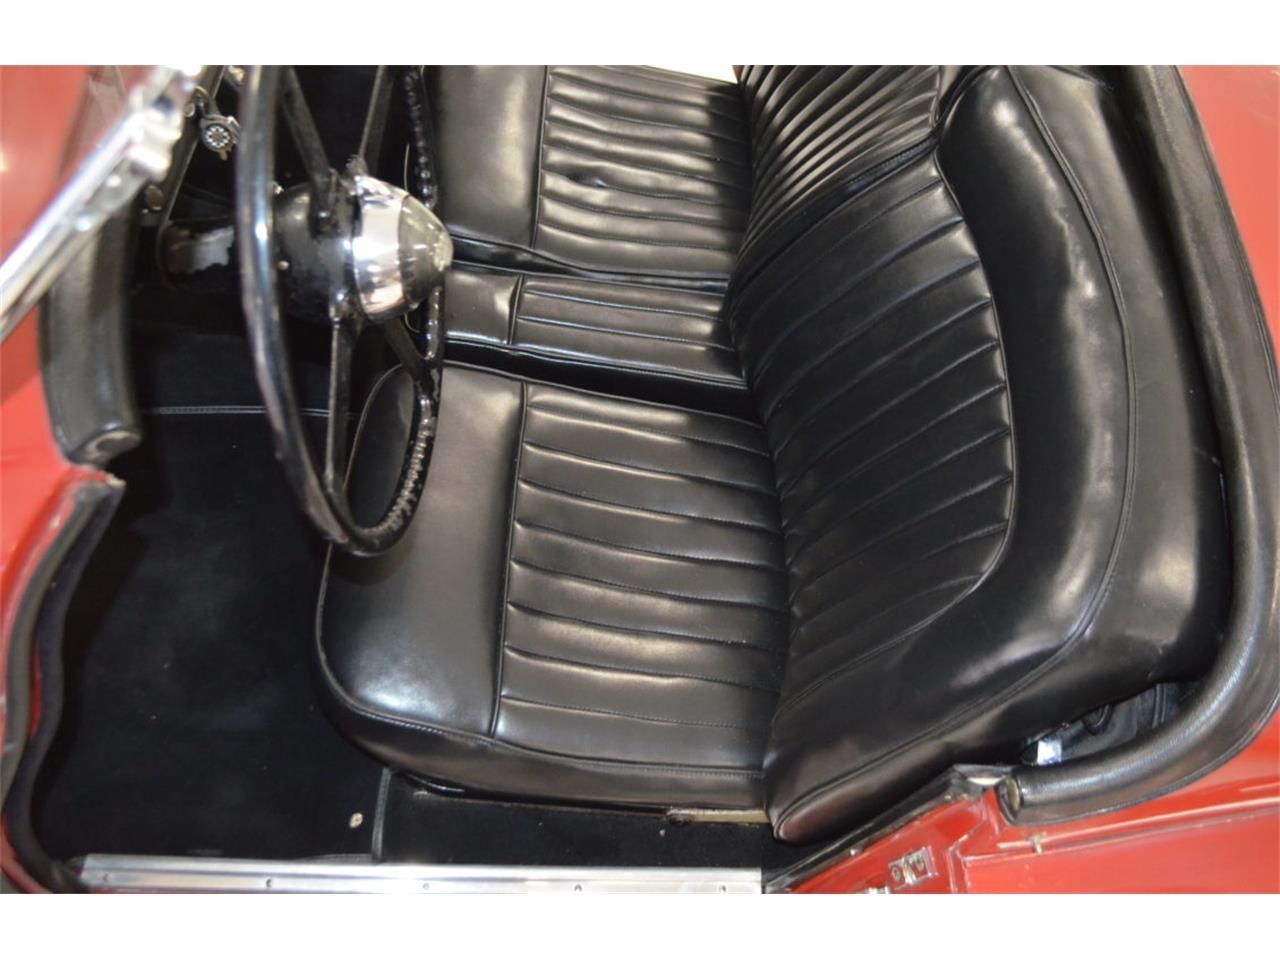 Large Picture of Classic 1952 Jaguar XK120 located in Phoenix Arizona - $69,800.00 Offered by Classic Promenade - PXTA